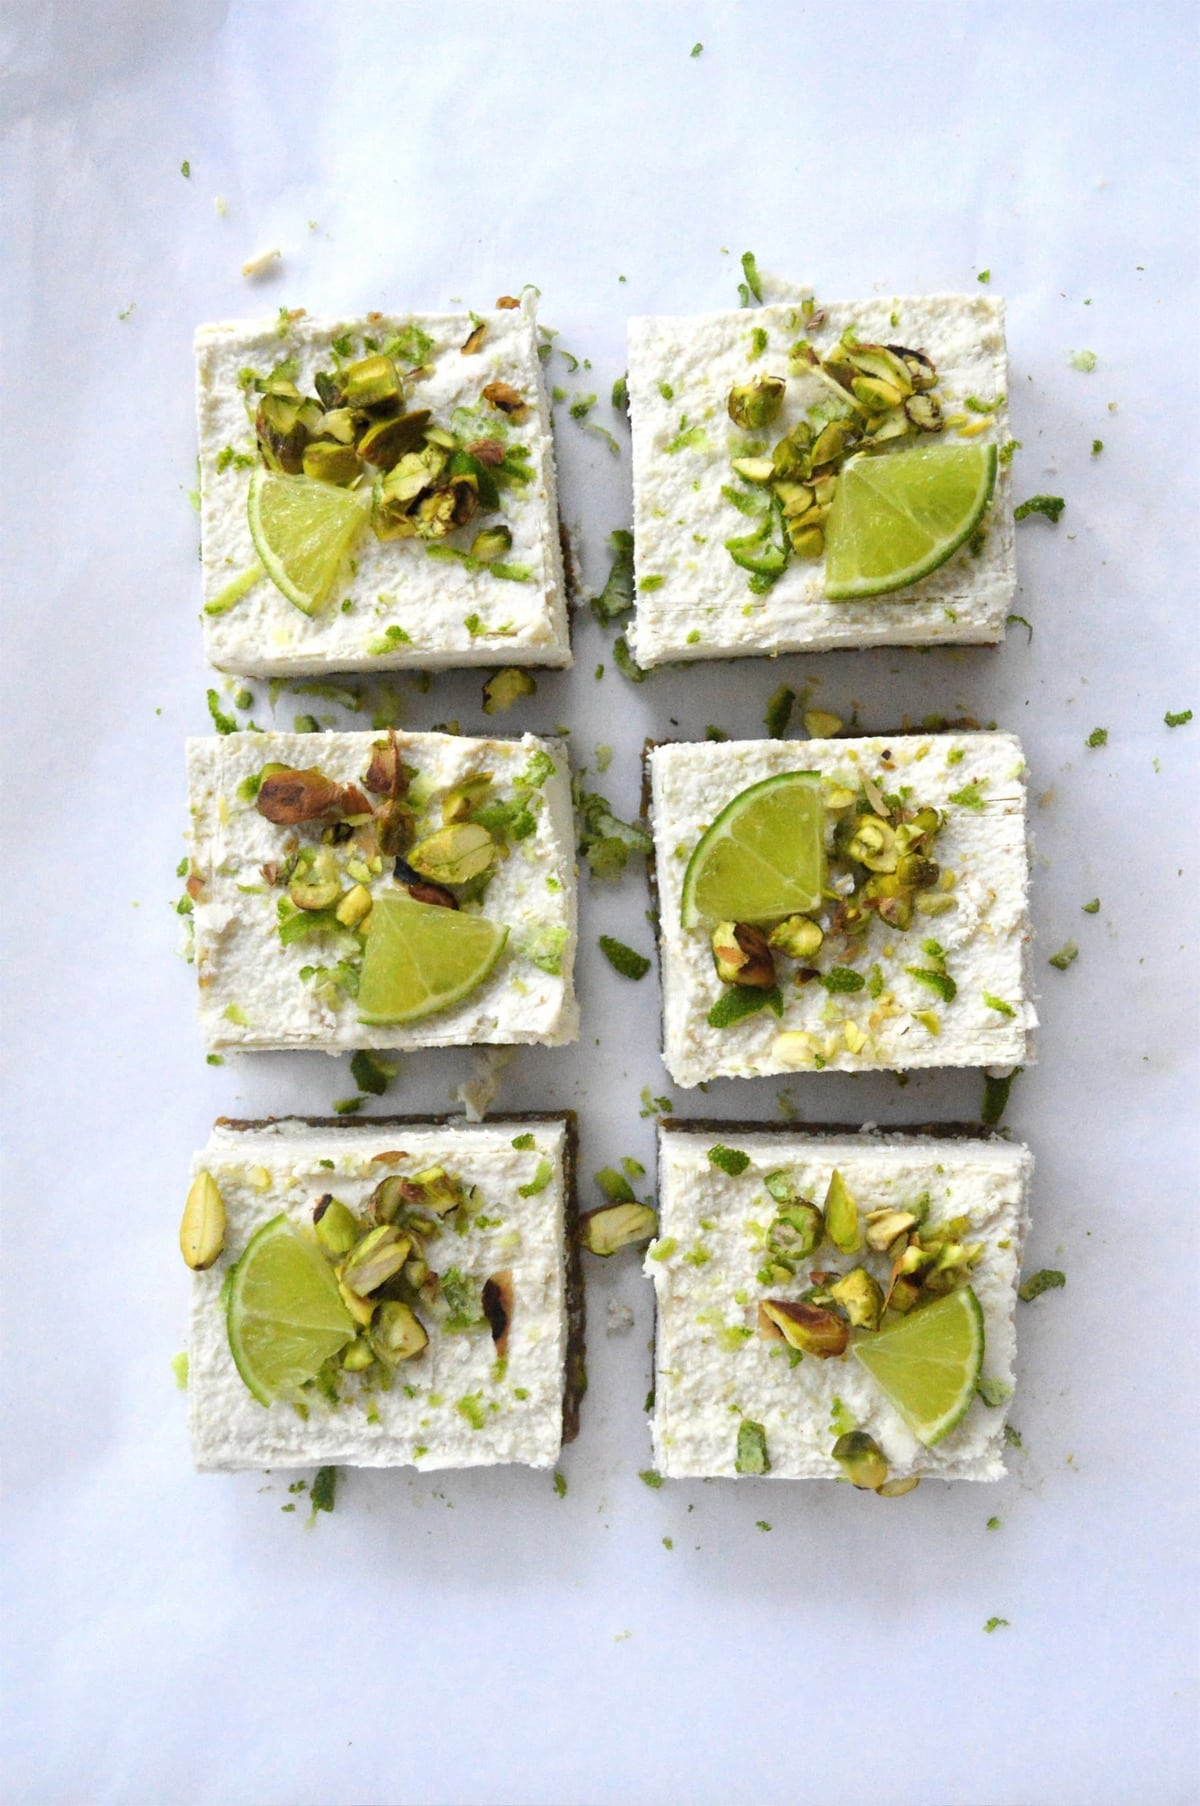 http://www.lifeofgoodness.com.au/raw-pistachio-coconut-lime-cheesecakes/